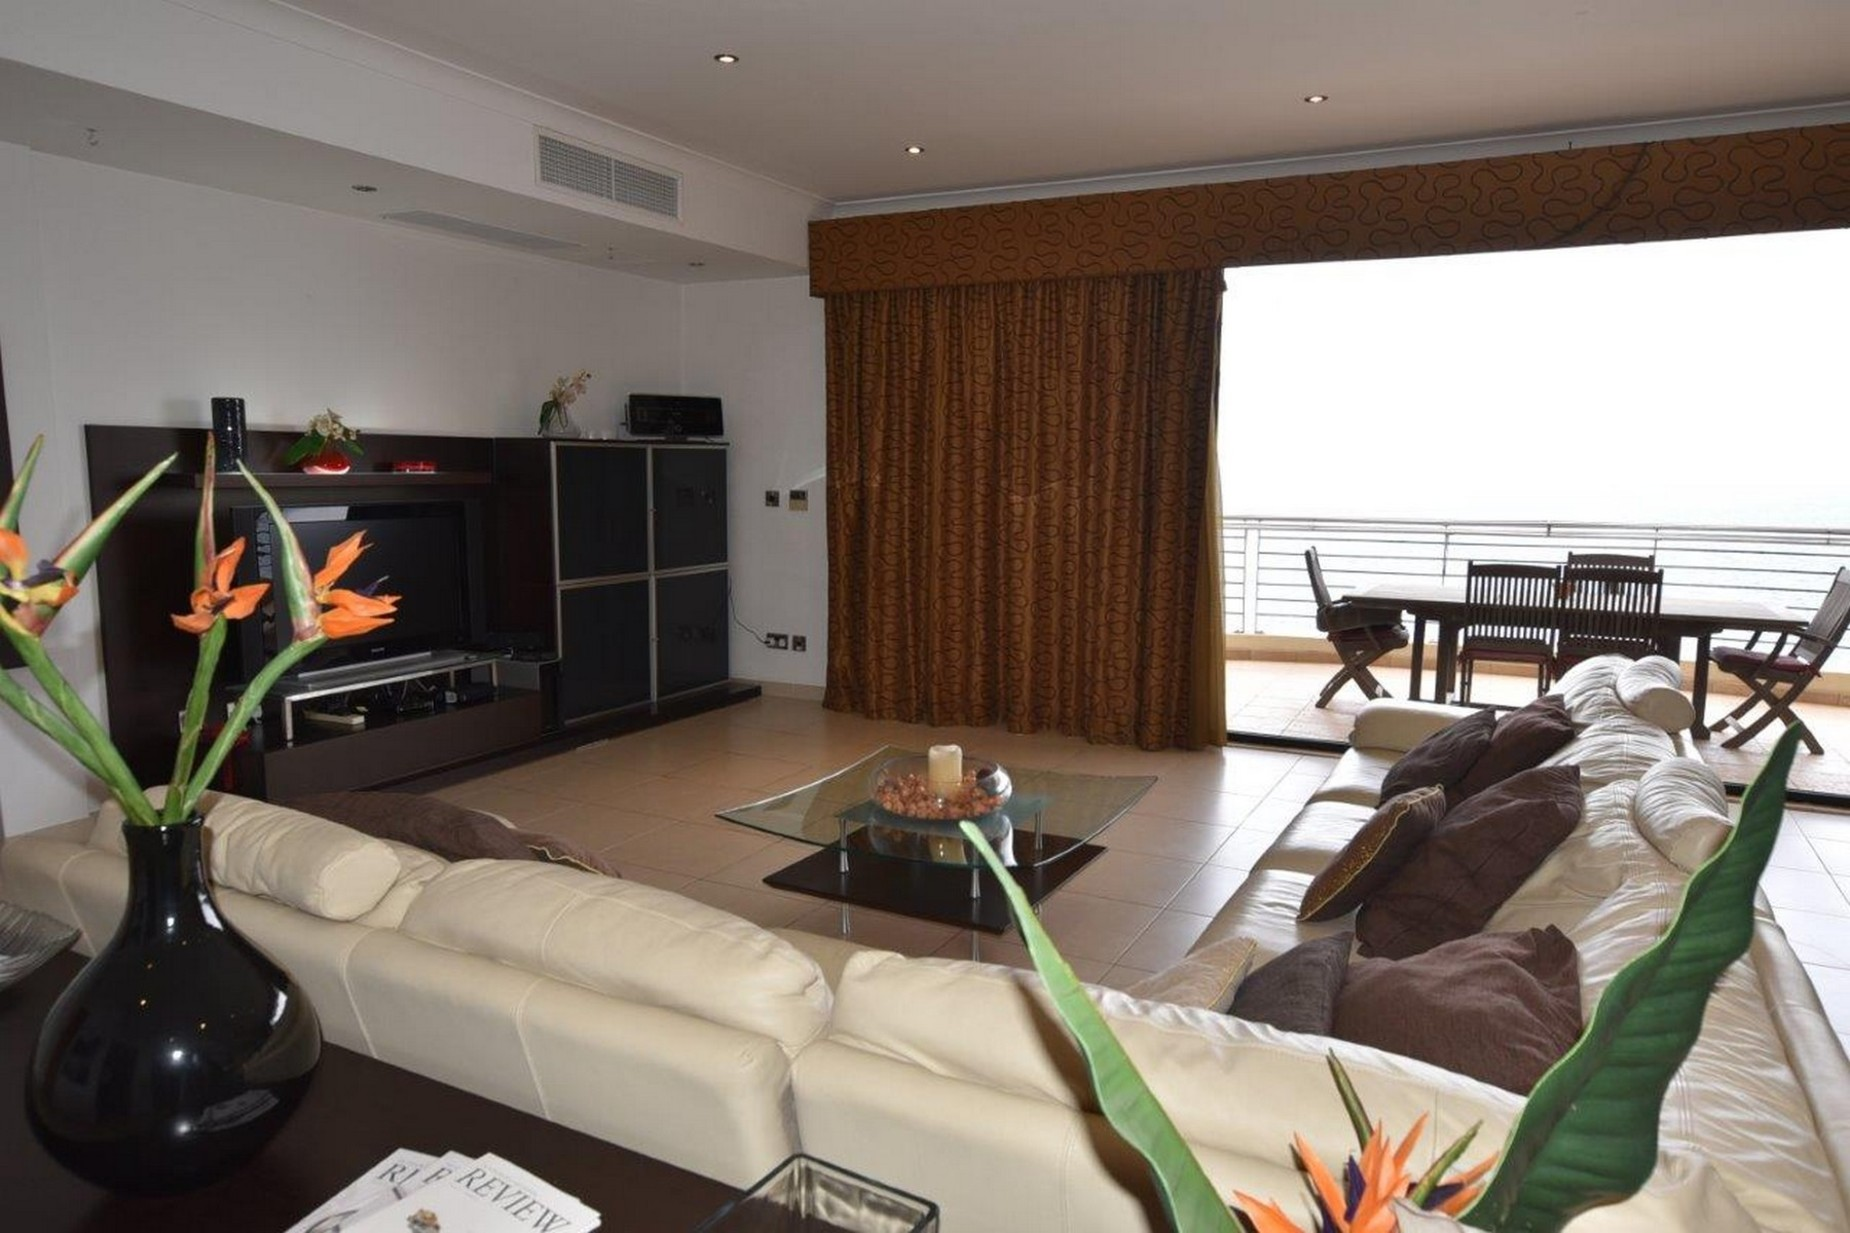 4 bed Apartment For Rent in Sliema, Sliema - thumb 8